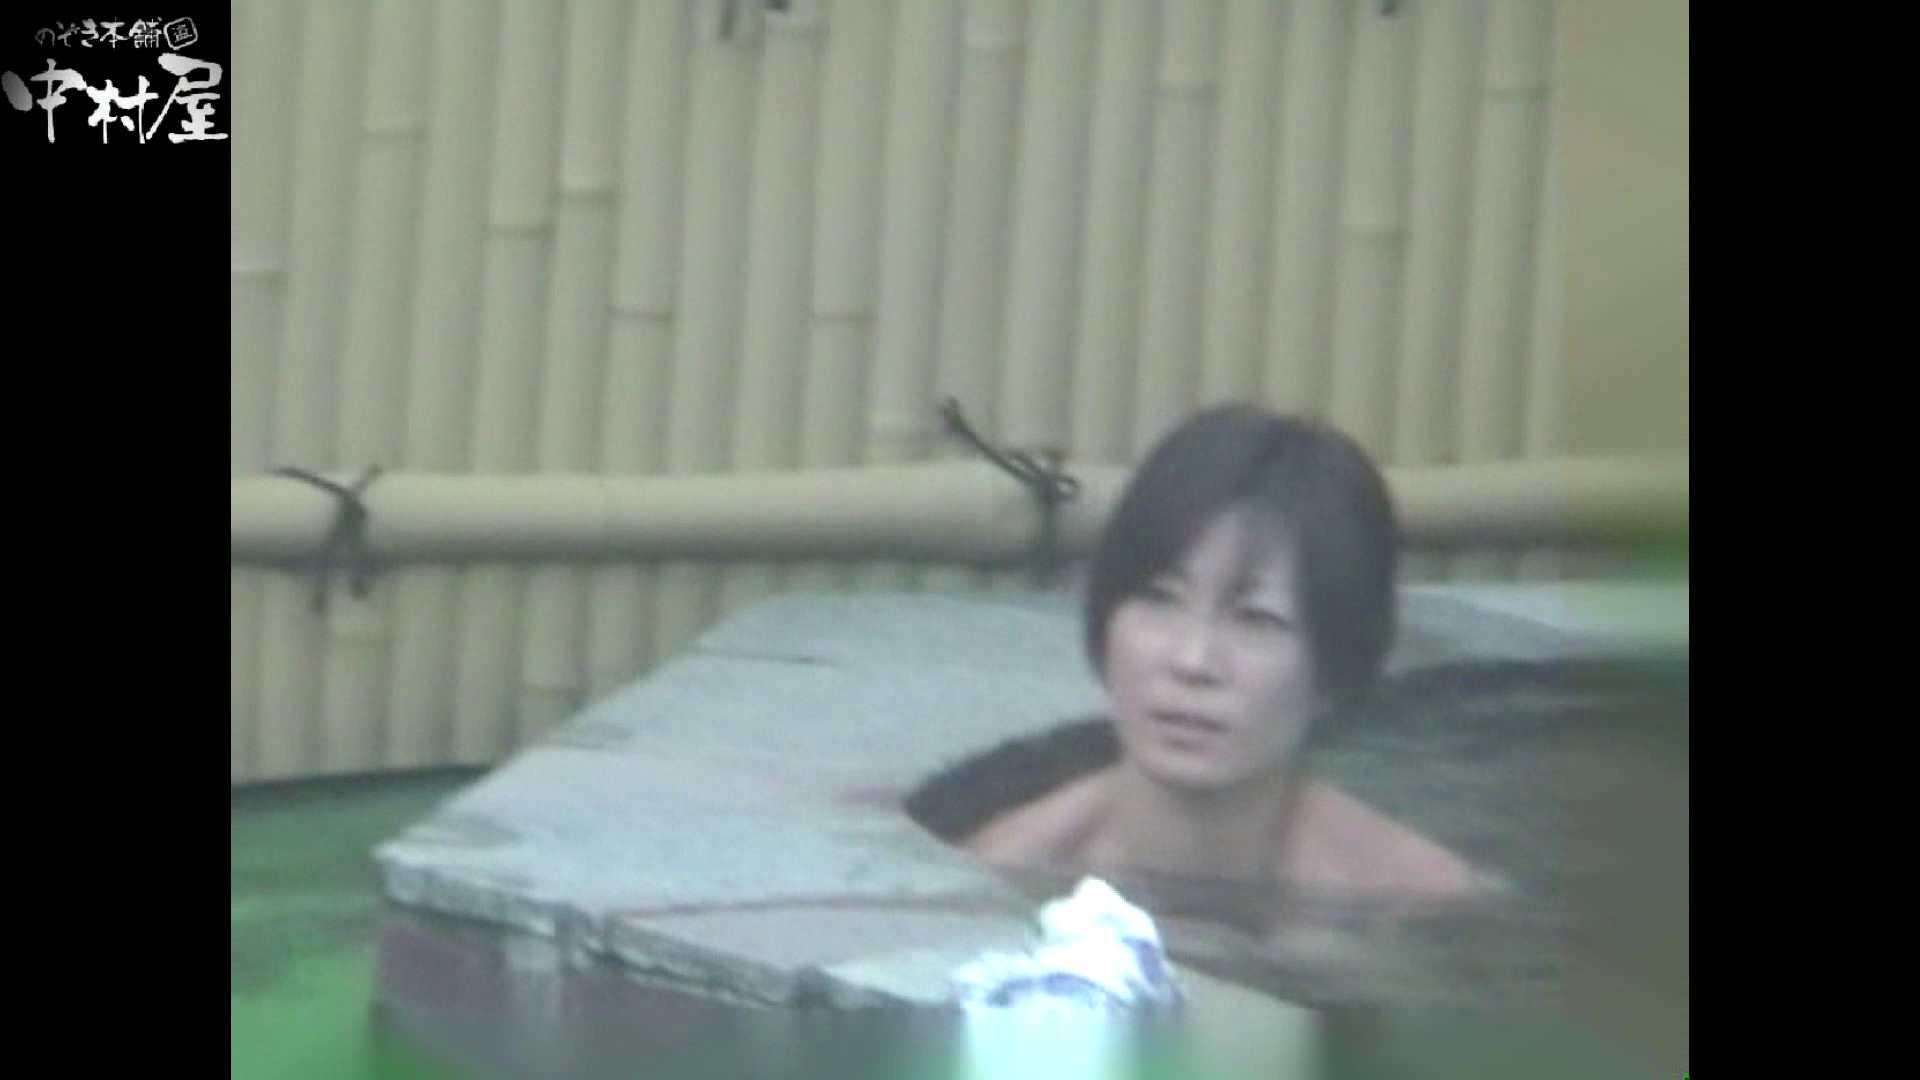 Aquaな露天風呂Vol.972 盗撮 おまんこ動画流出 80画像 50